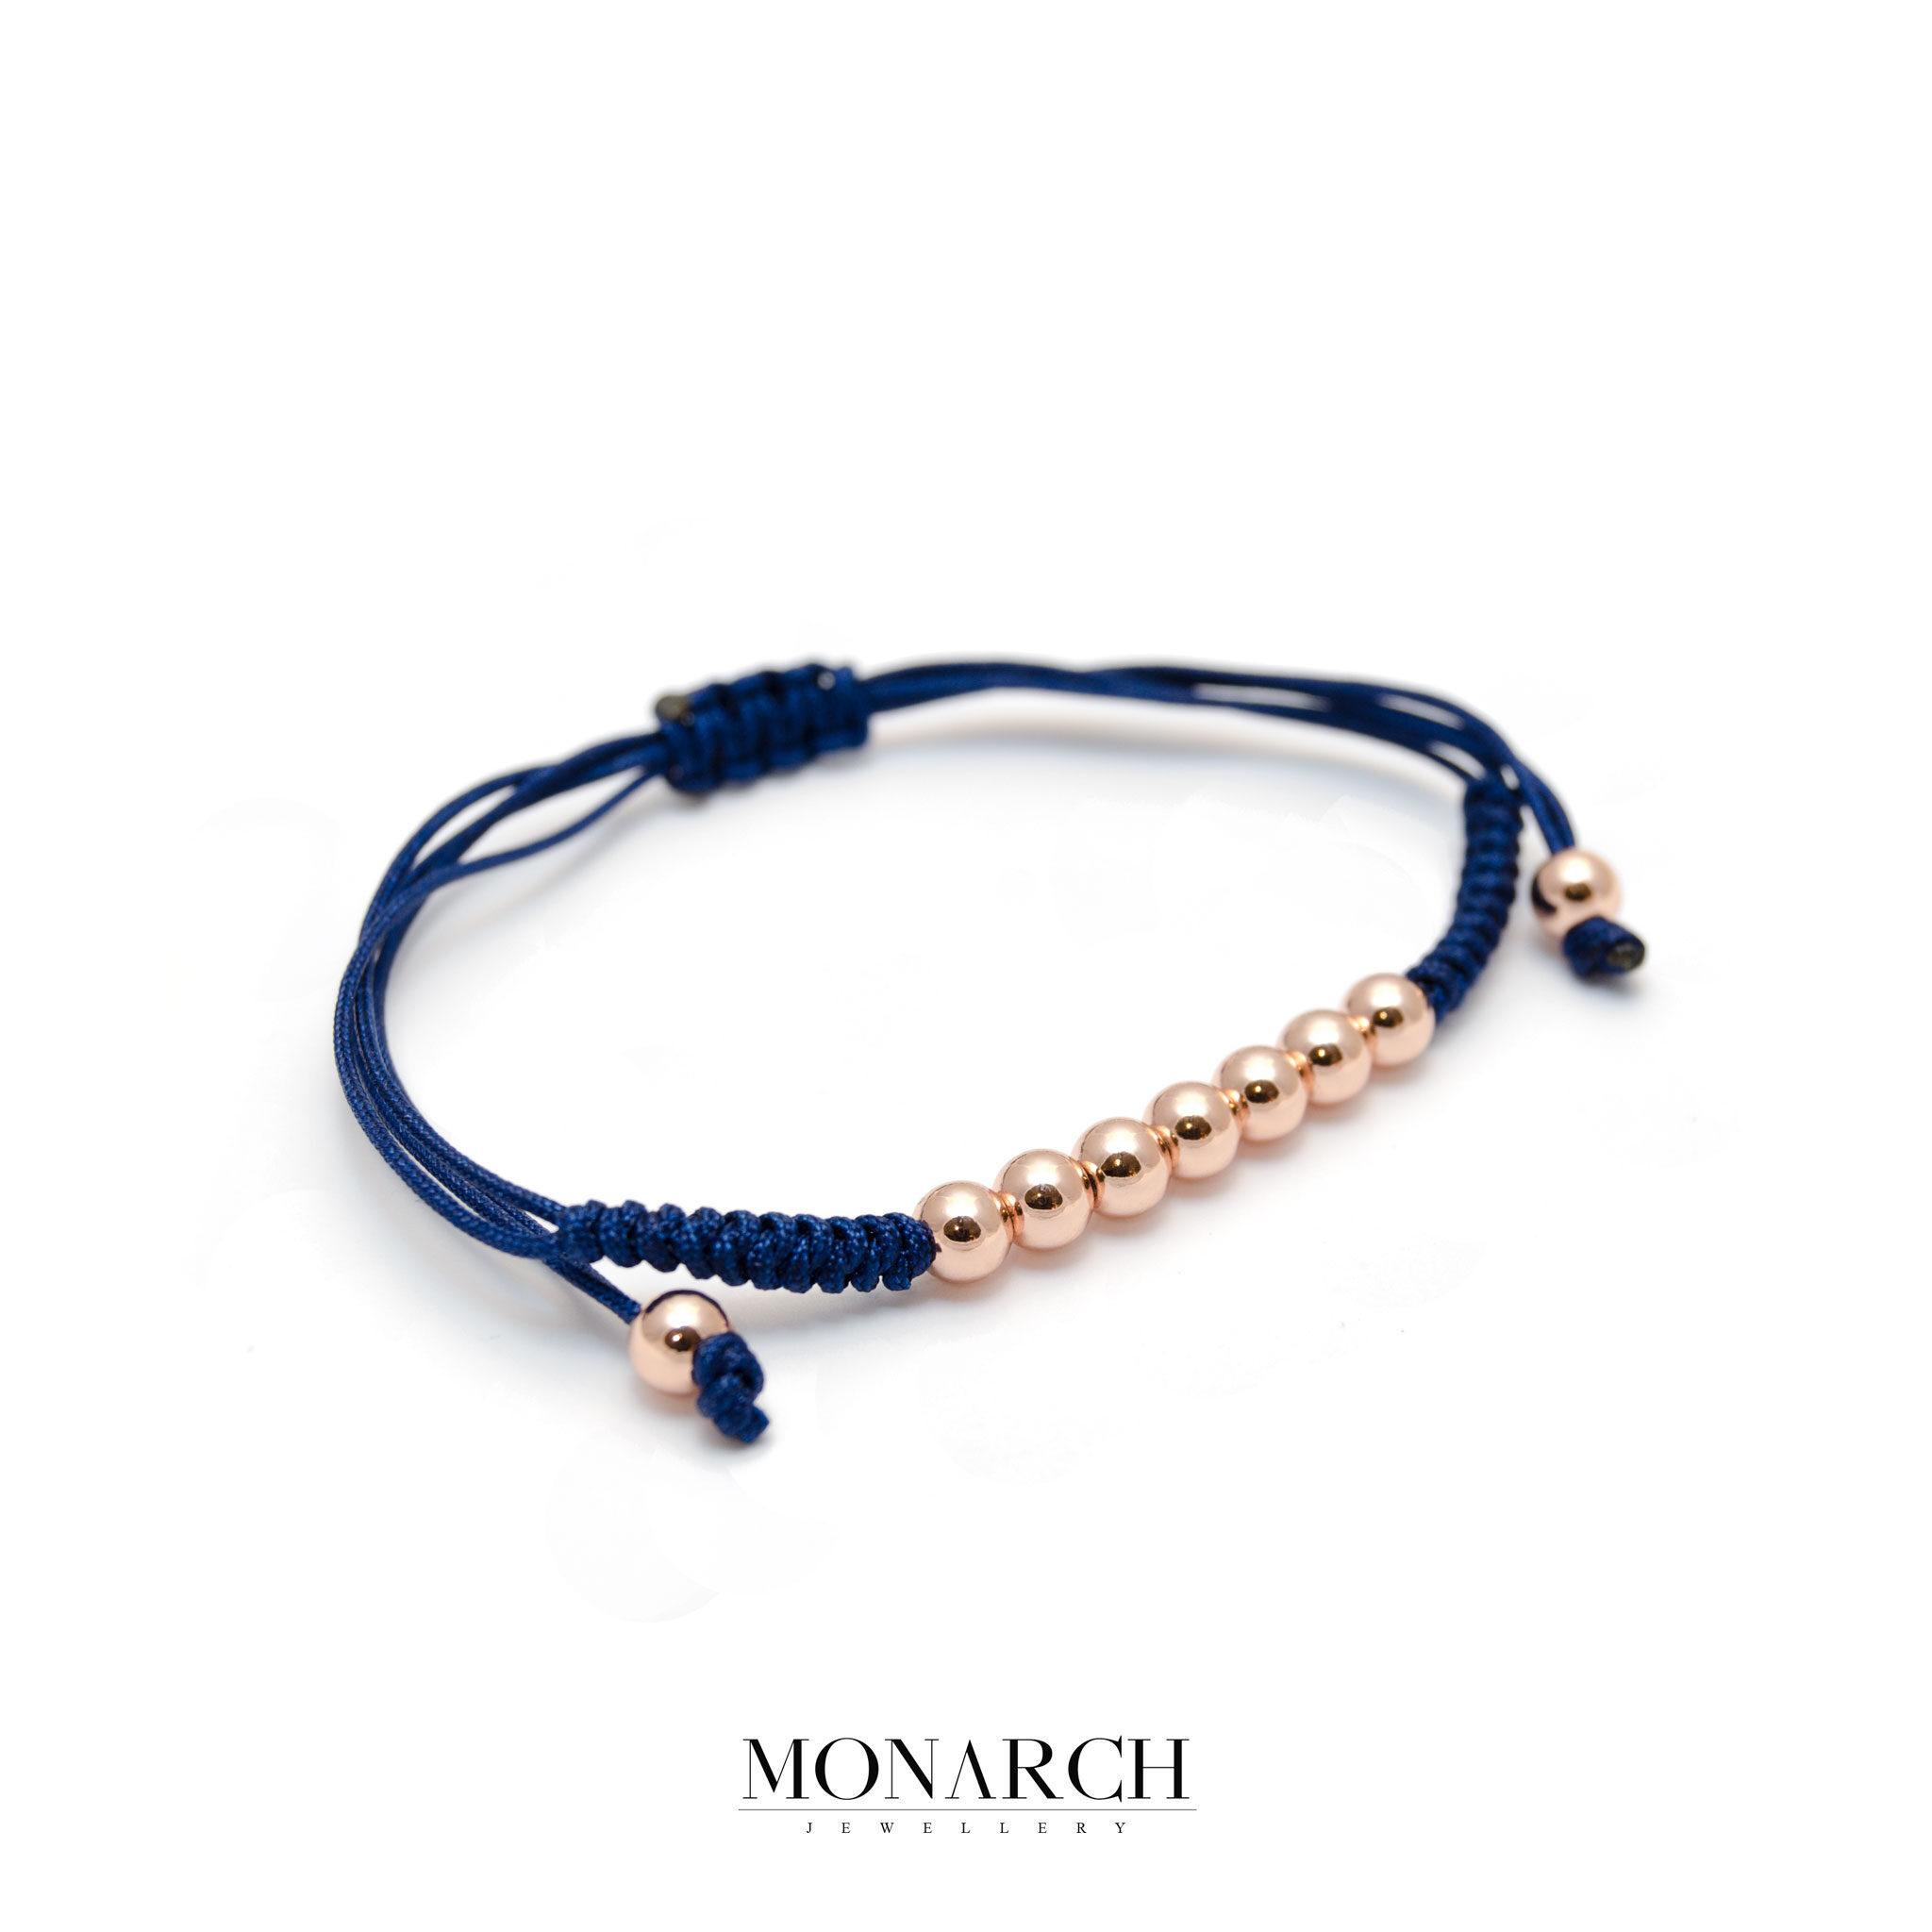 Monarch Jewellery Gold Rose Bead Azur Macrame Bracelet